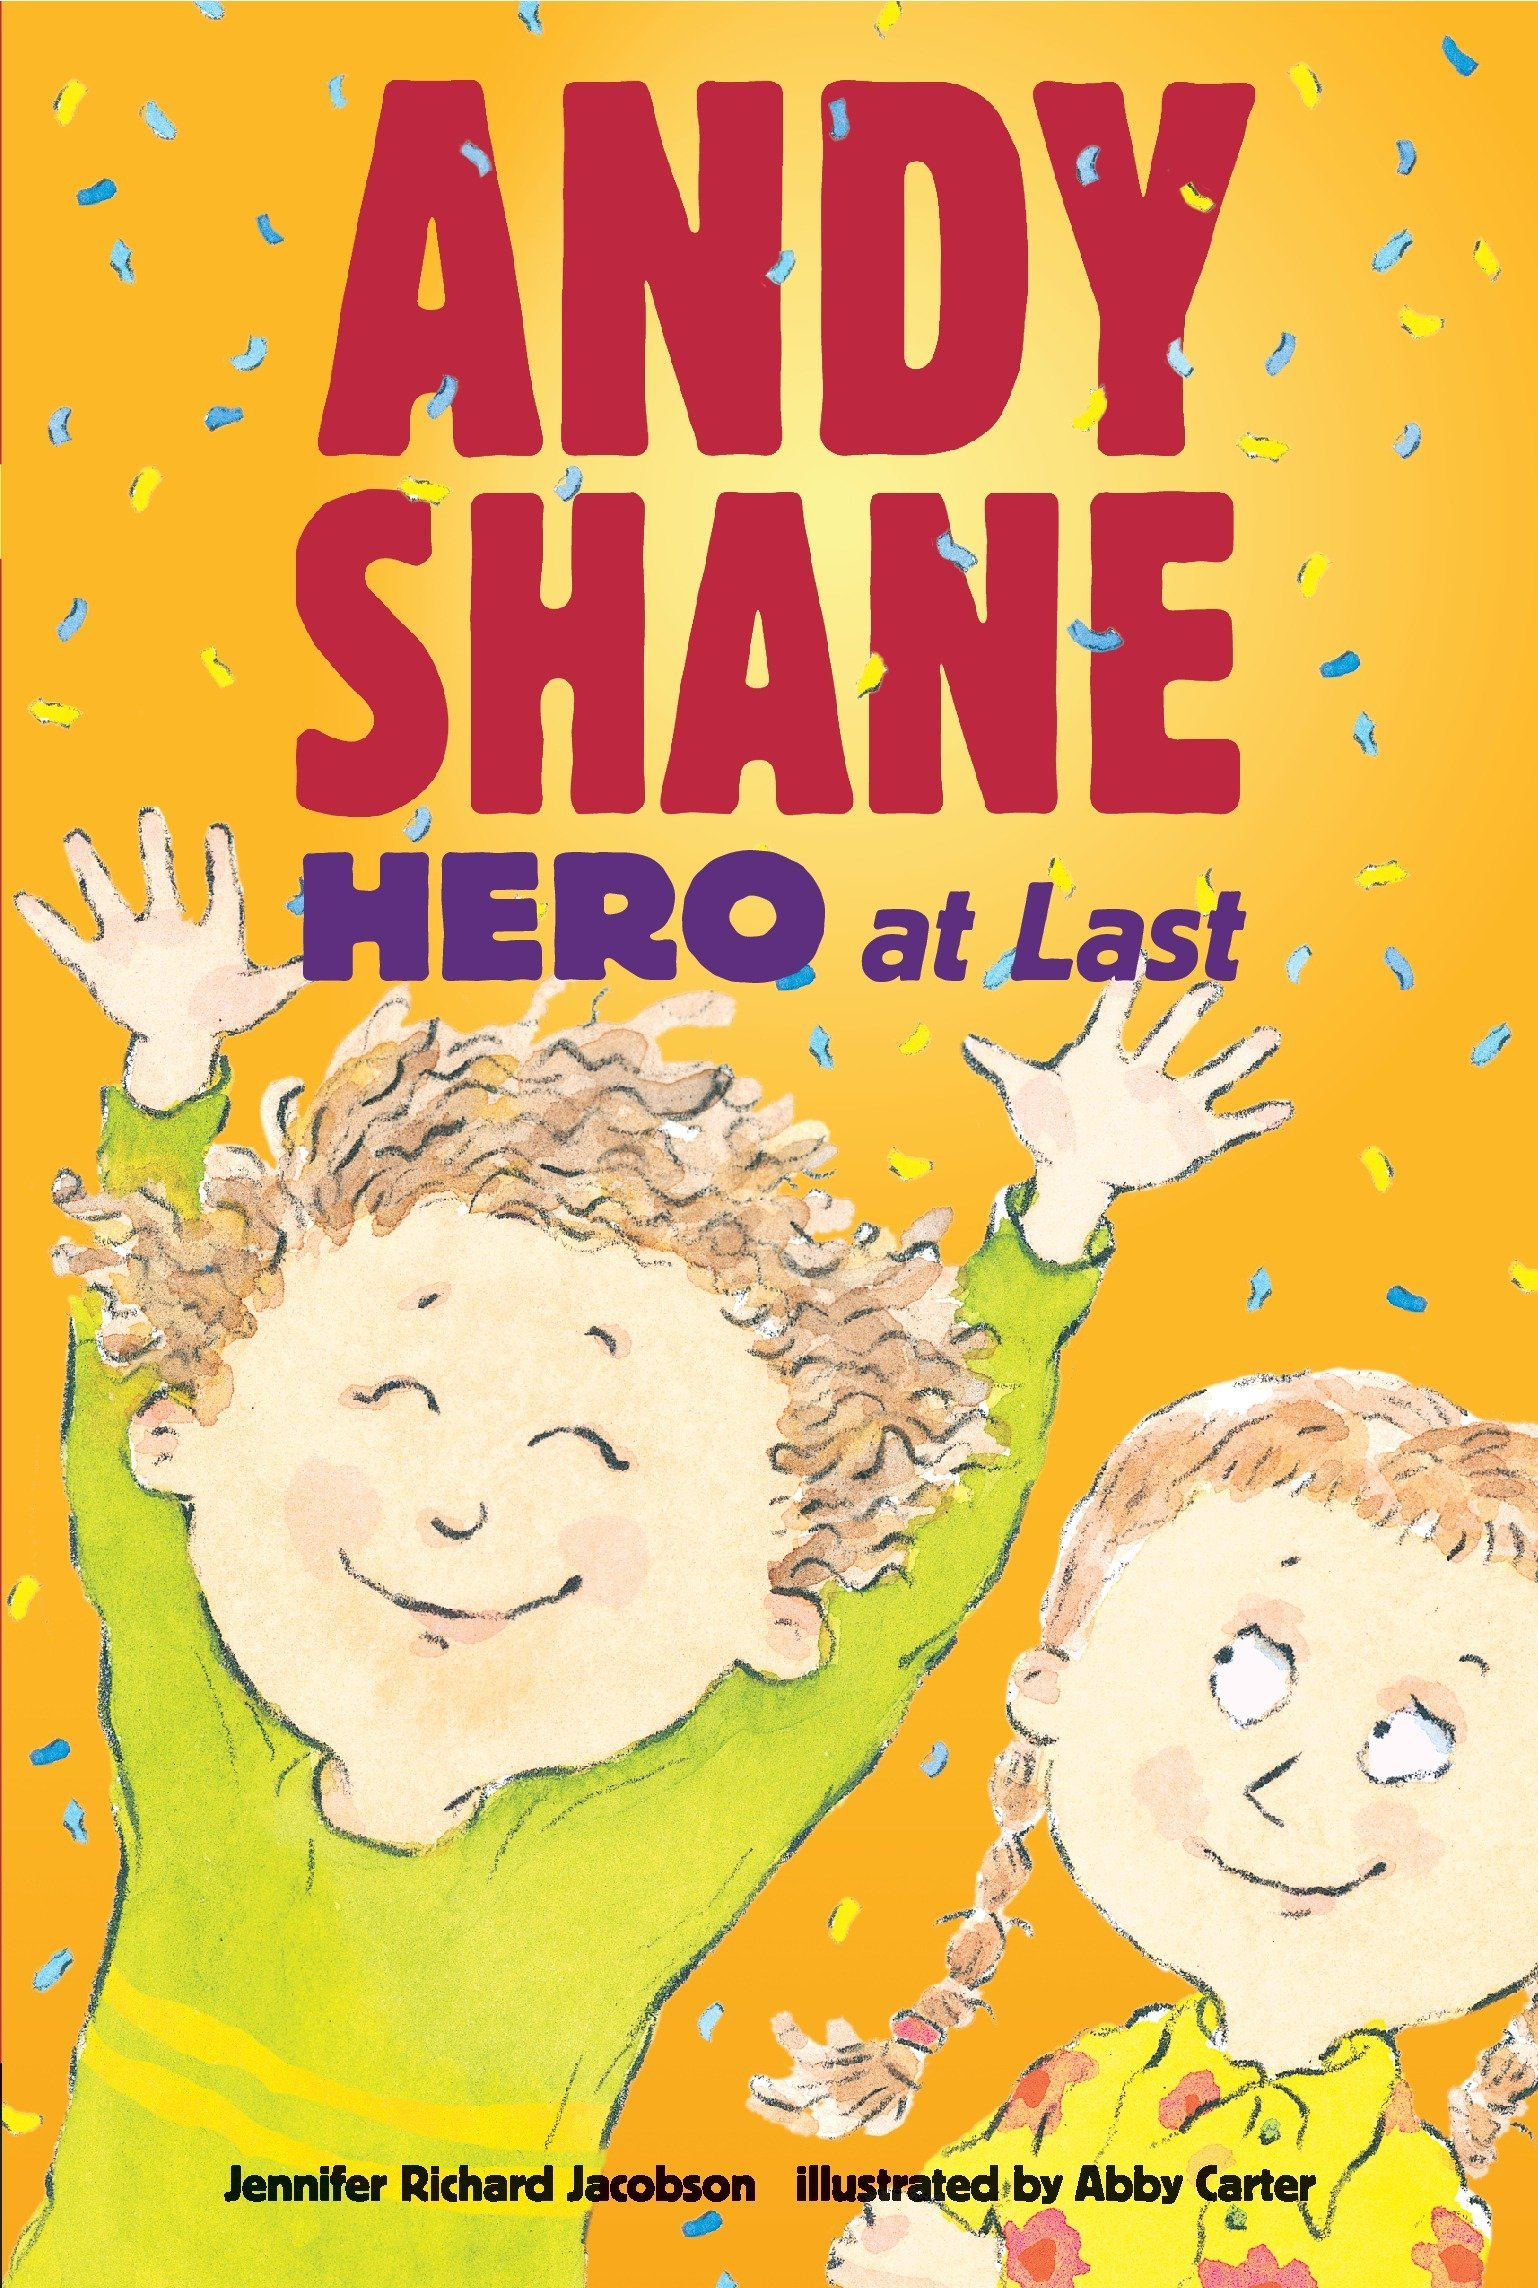 Amazon.com: Andy Shane, Hero at Last (9780763652937): Jennifer Richard  Jacobson, Abby Carter: Books